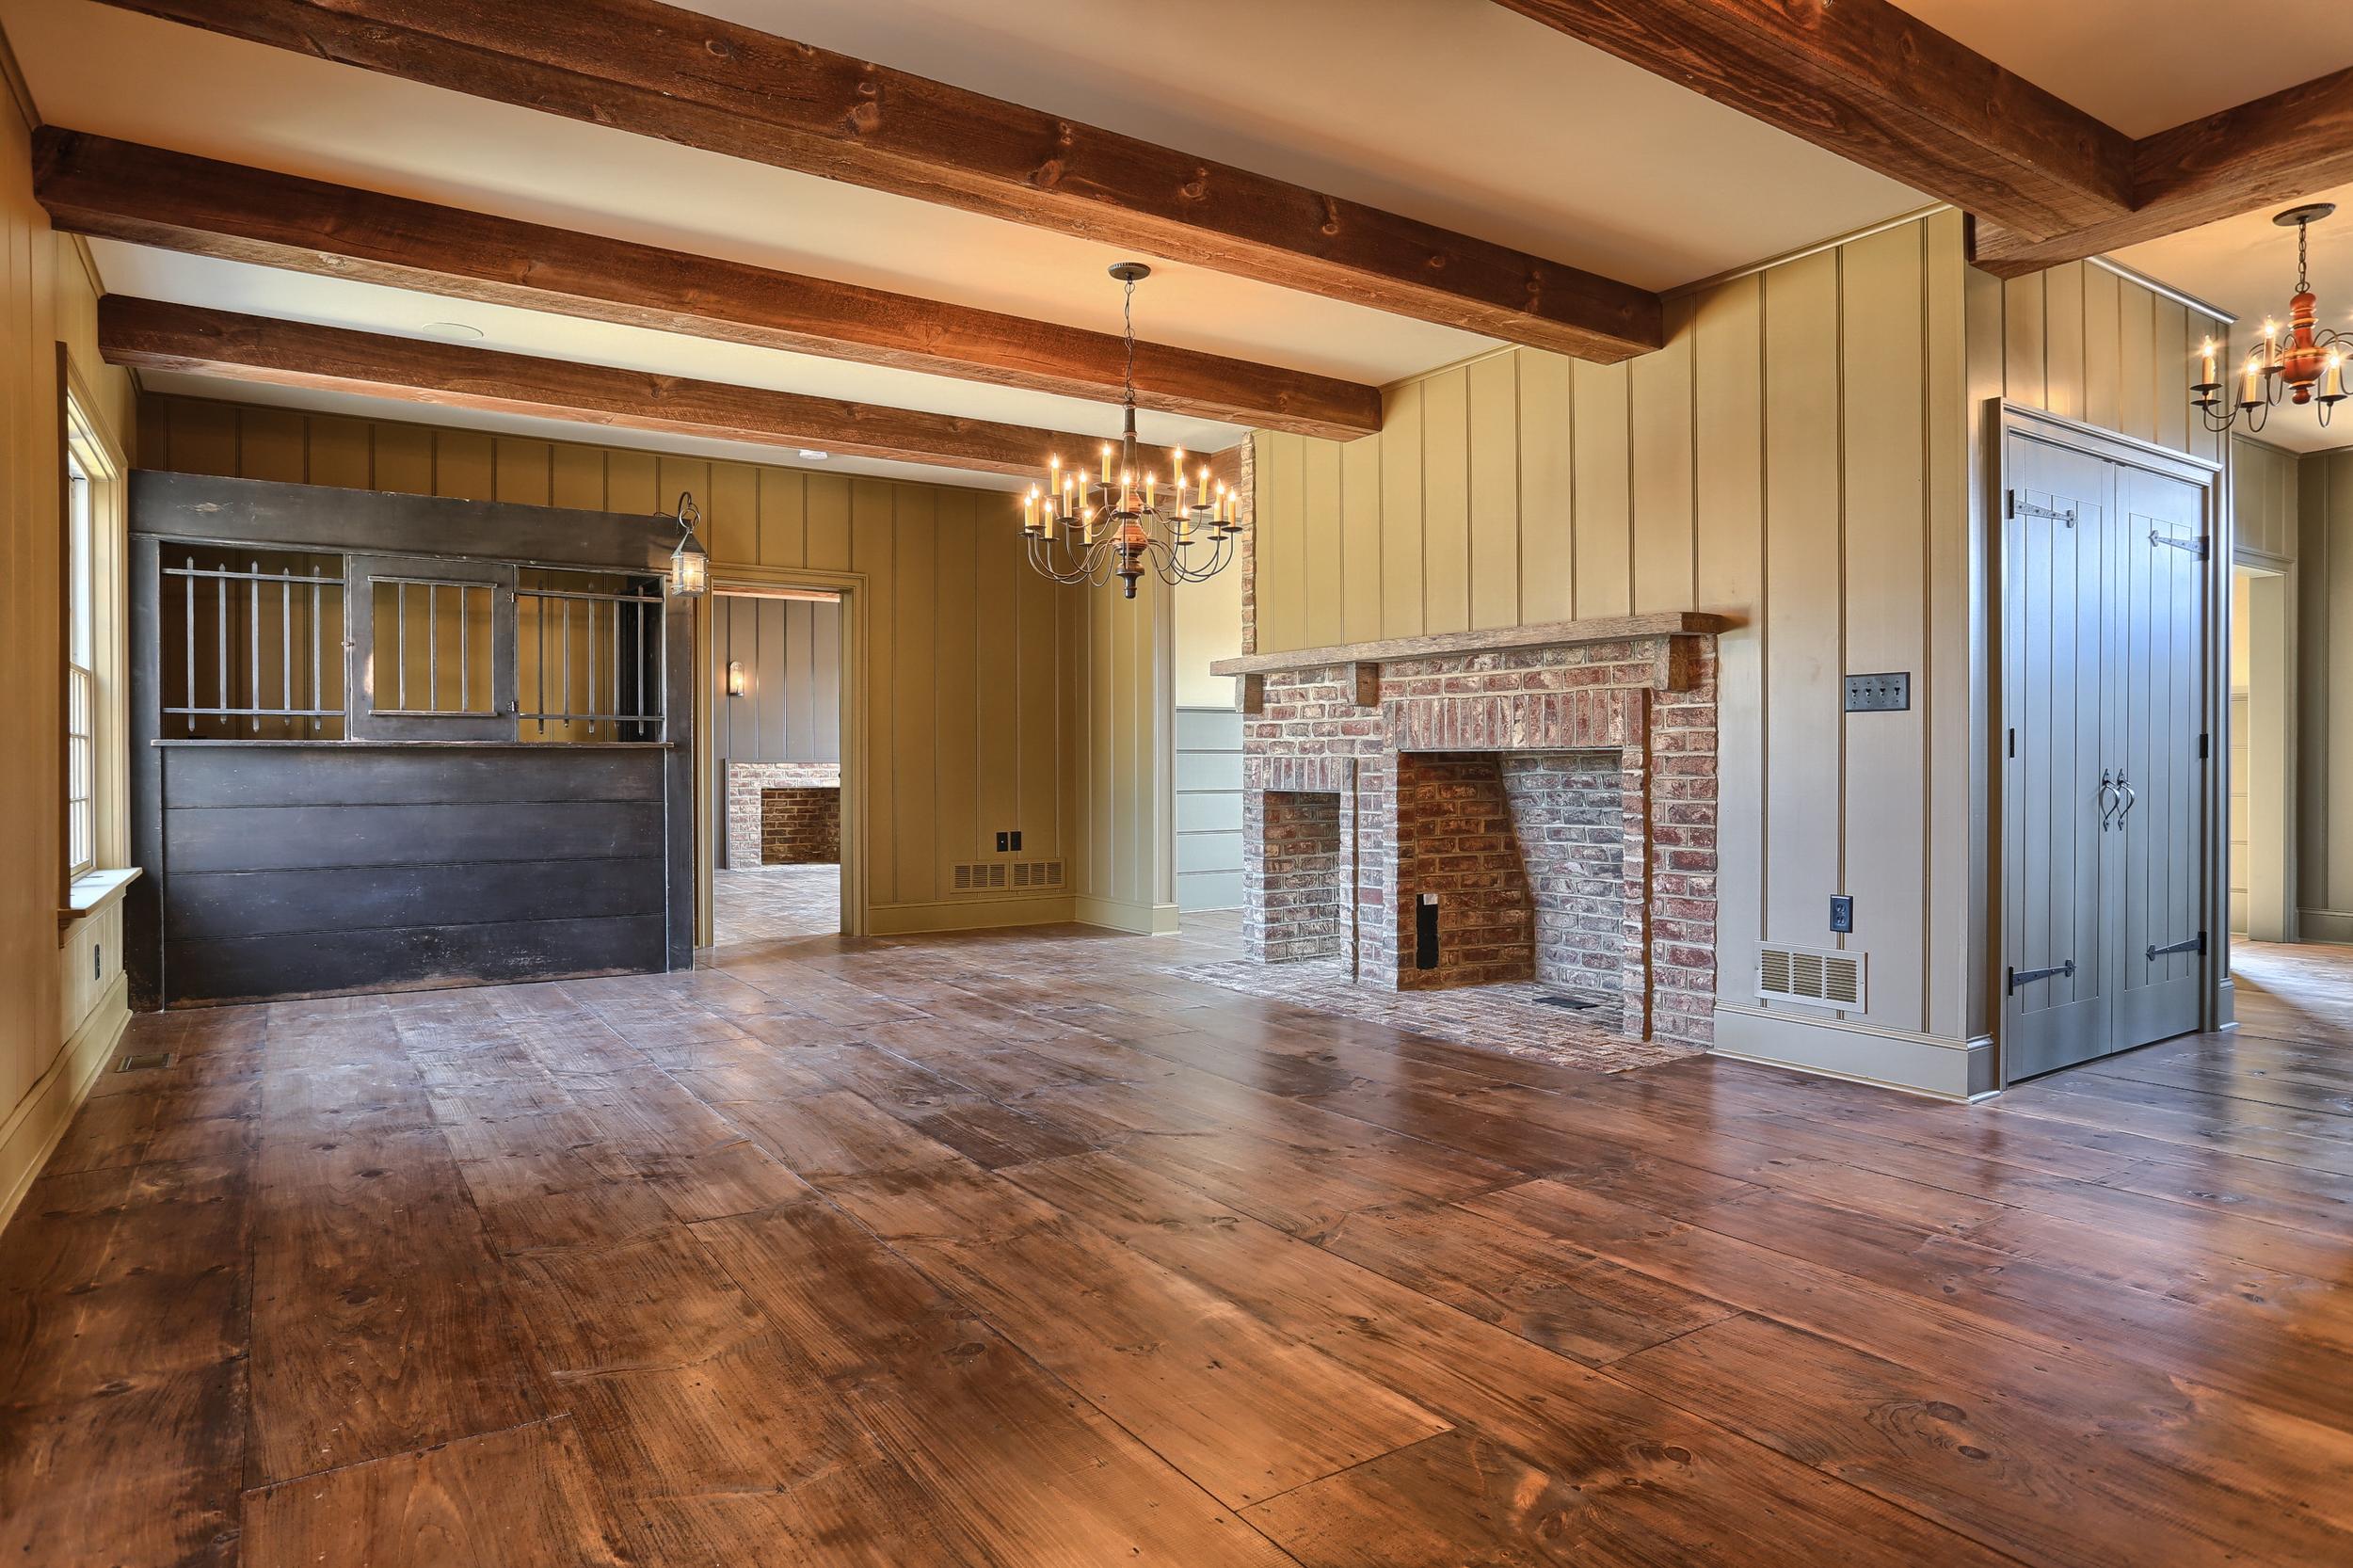 The Farmhouse Colonial Exterior Trim And Siding The